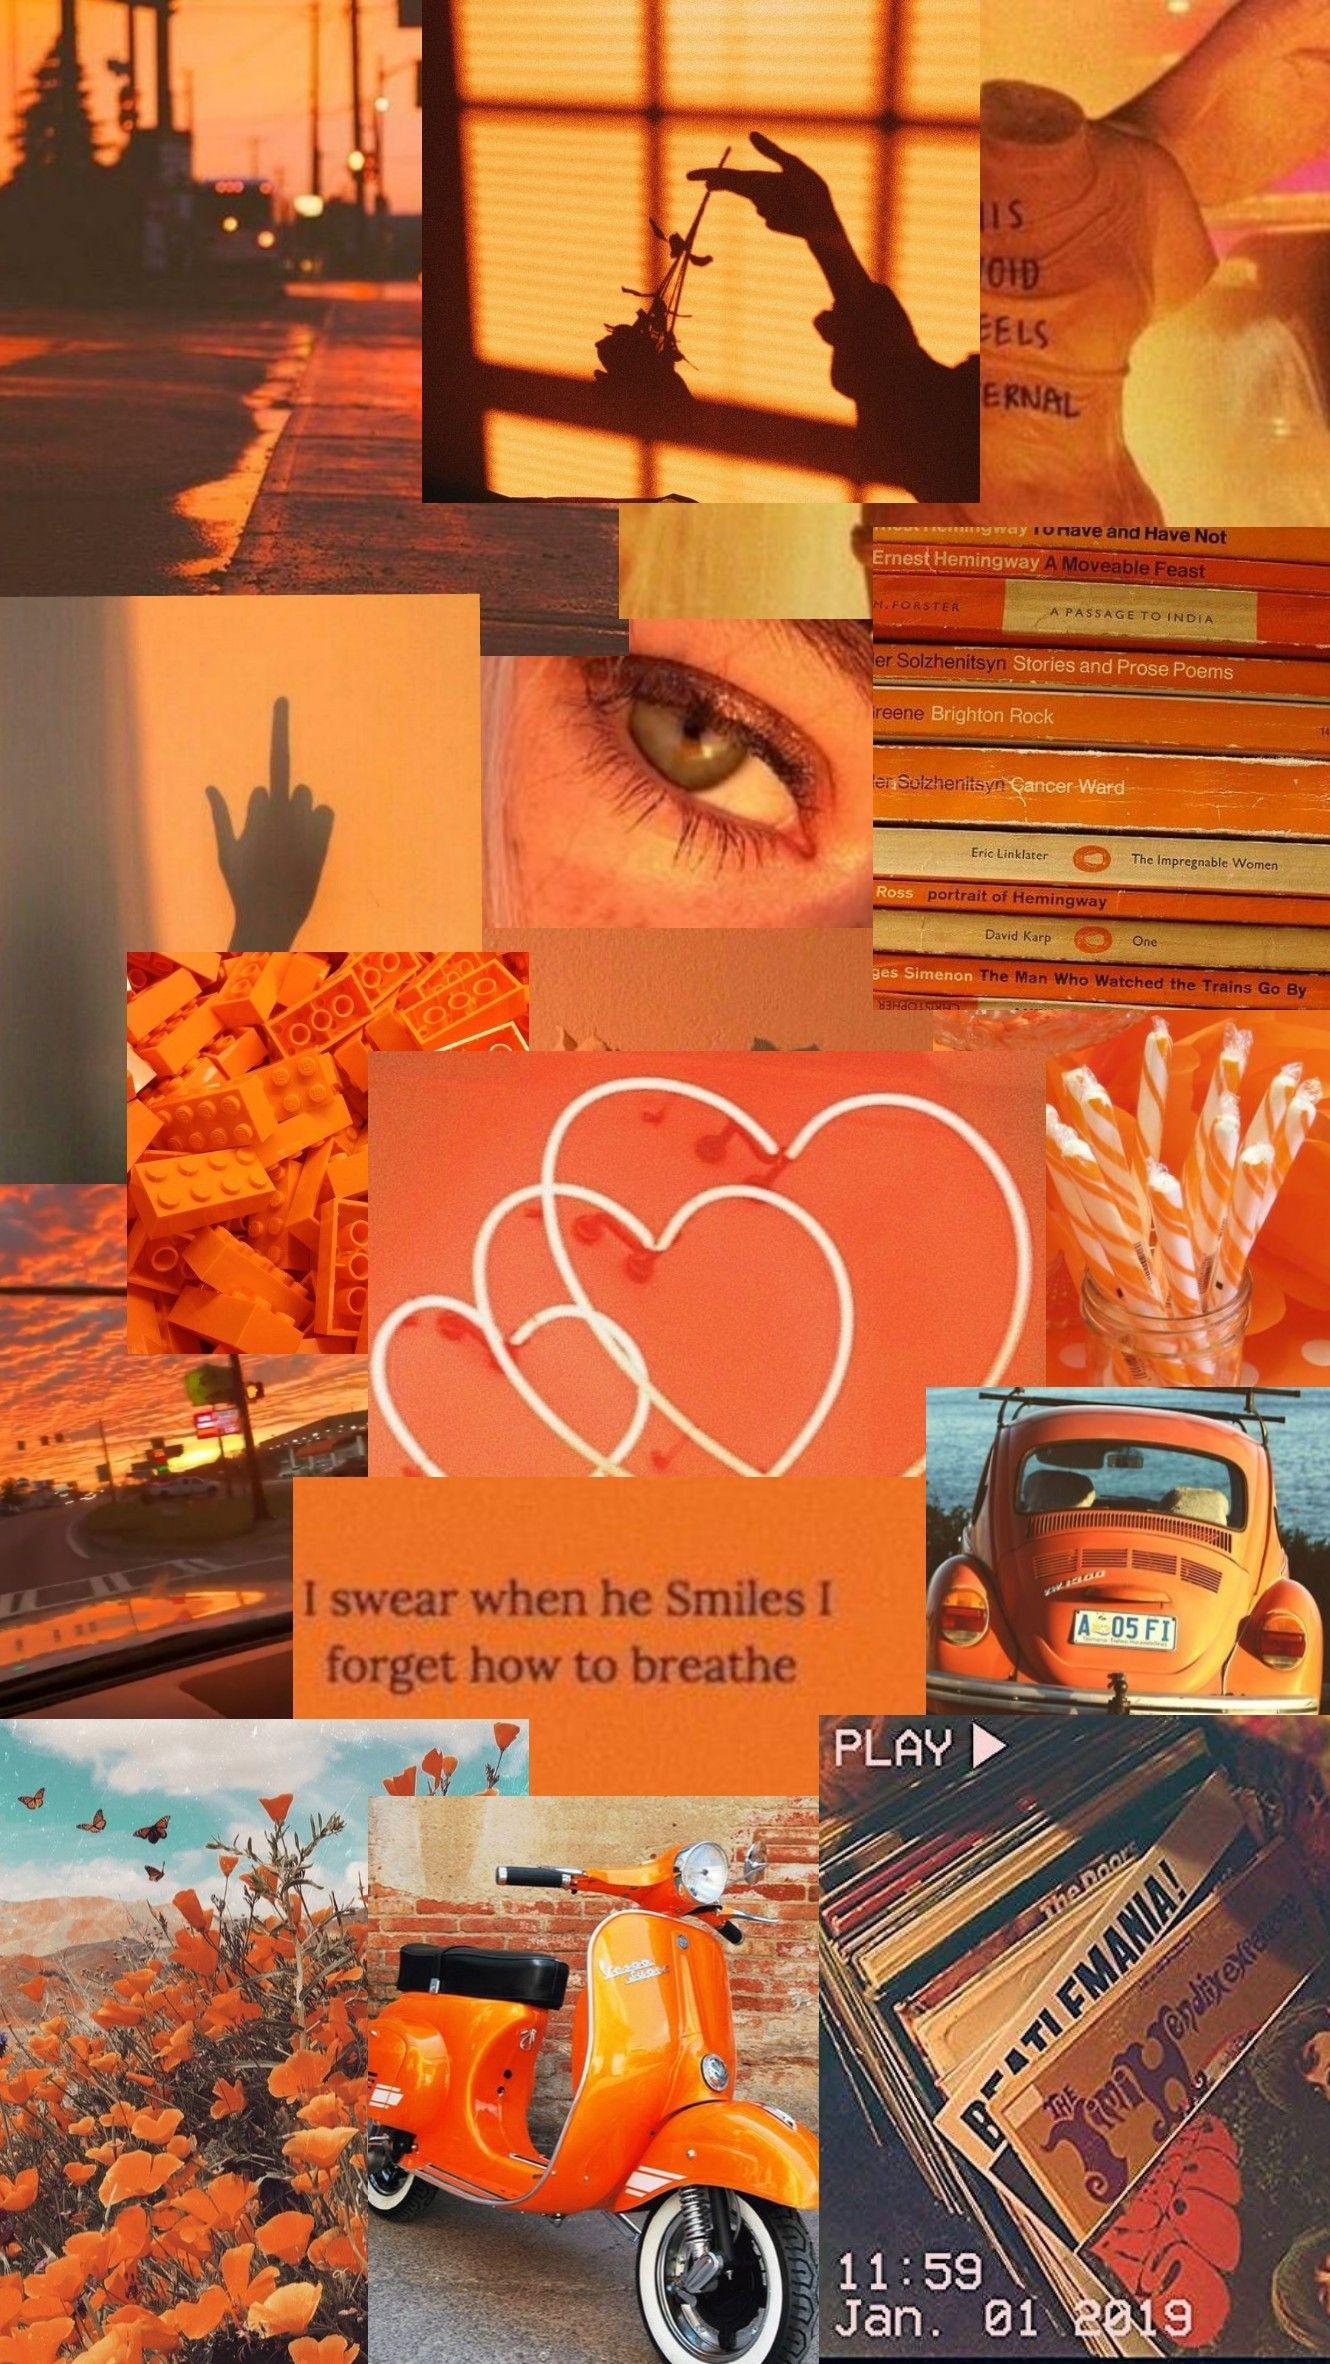 Orange Aesthetic In 2020 Aesthetic Iphone Wallpaper Aesthetic Pastel Wallpaper Iphone Wallpaper Tumblr Aesthetic